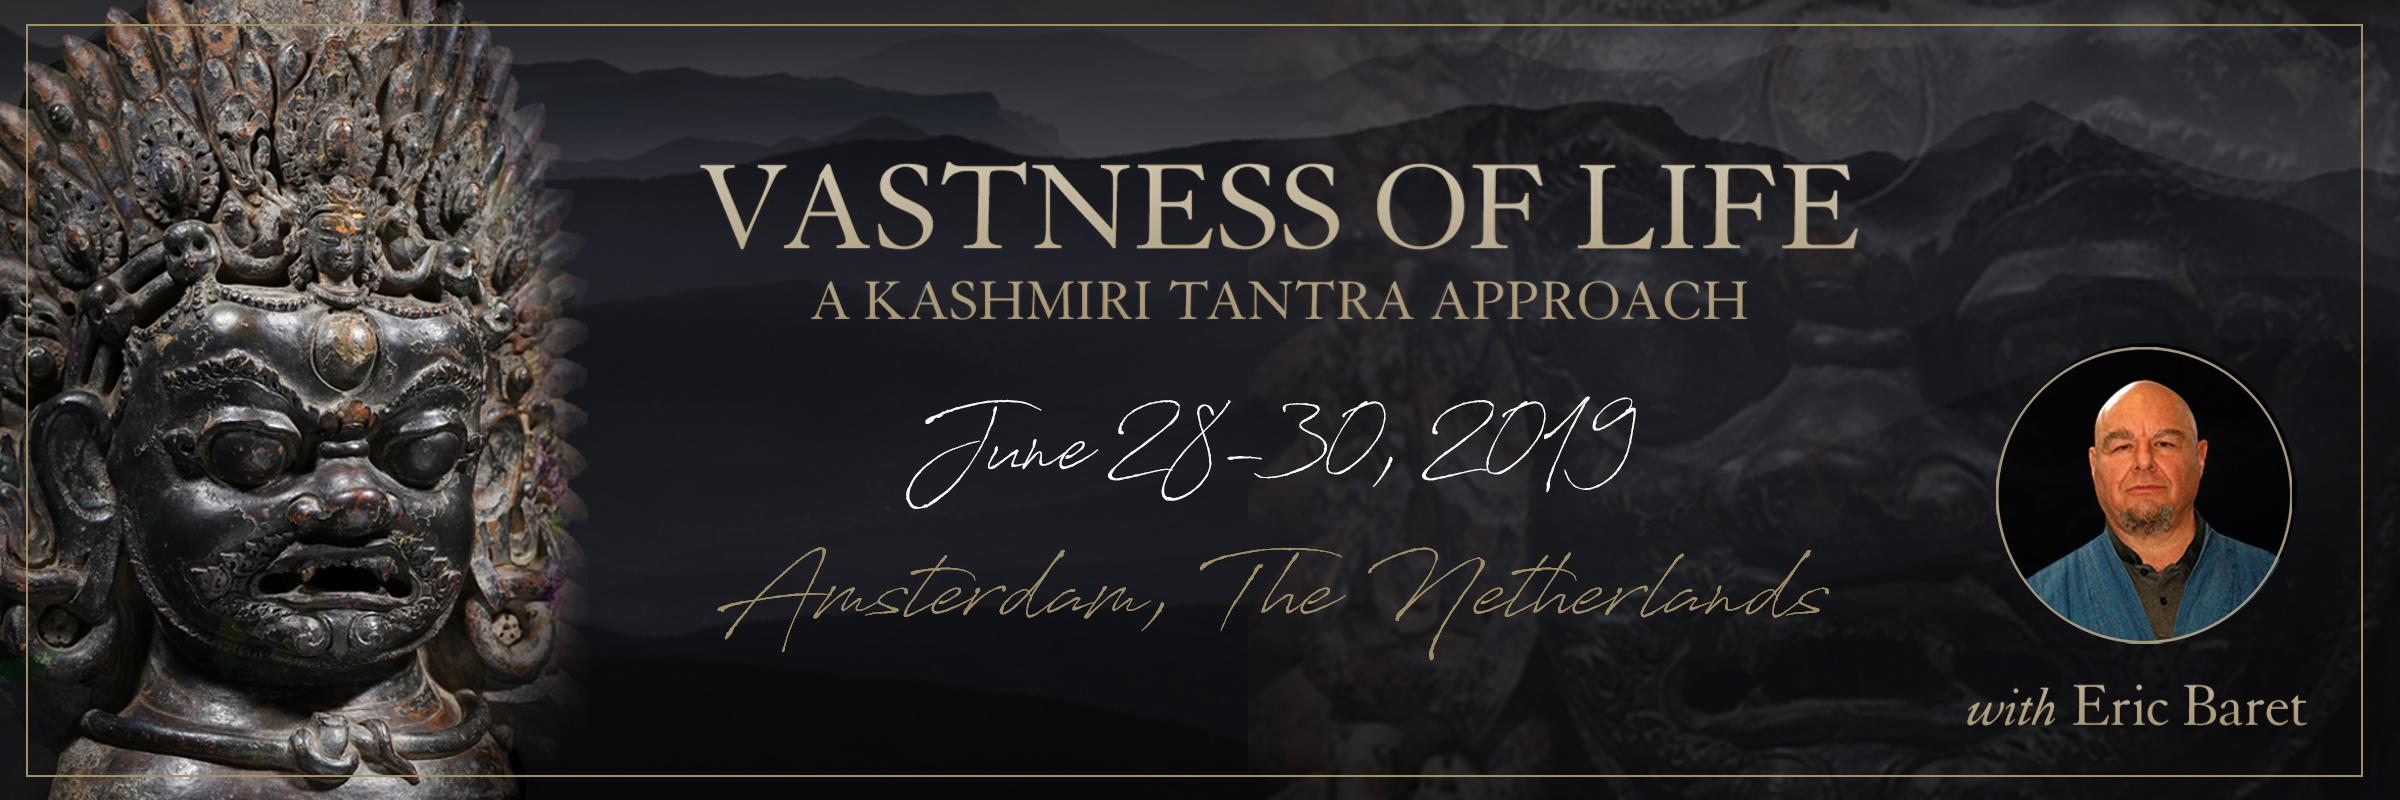 Exploring Life Through Kashmiri Tantric Shaivism